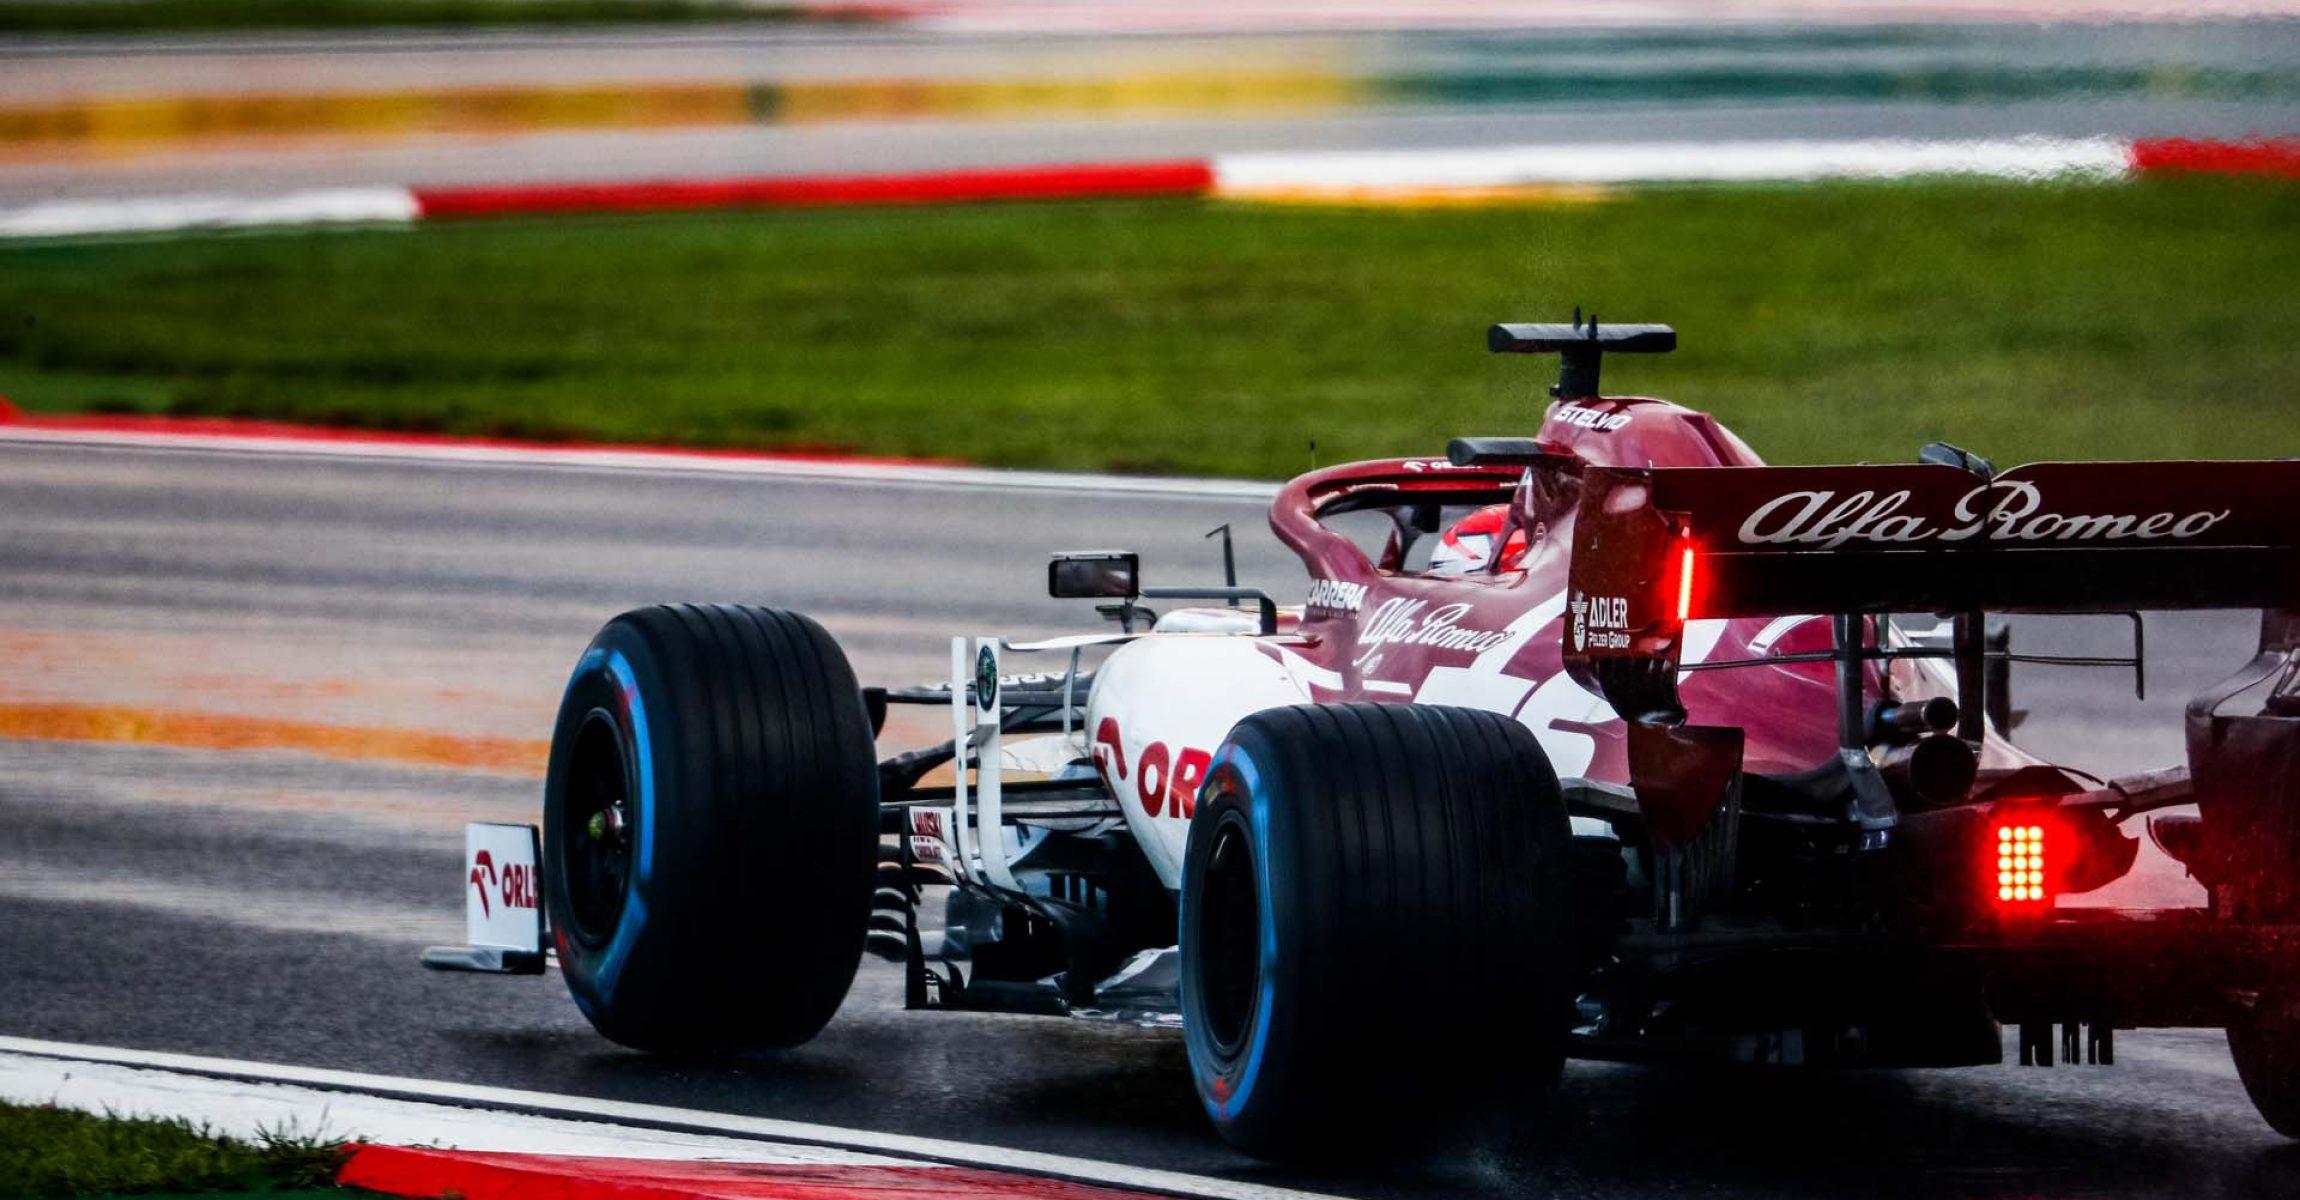 07 RAIKKONEN Kimi (fin), Alfa Romeo Racing ORLEN C39, action during the Formula 1 DHL Turkish Grand Prix 2020, from November 13 to 15, 2020 on the  Intercity Istanbul Park, in Tuzla, near Istanbul, Turkey - Photo Antonin Vincent / DPPI